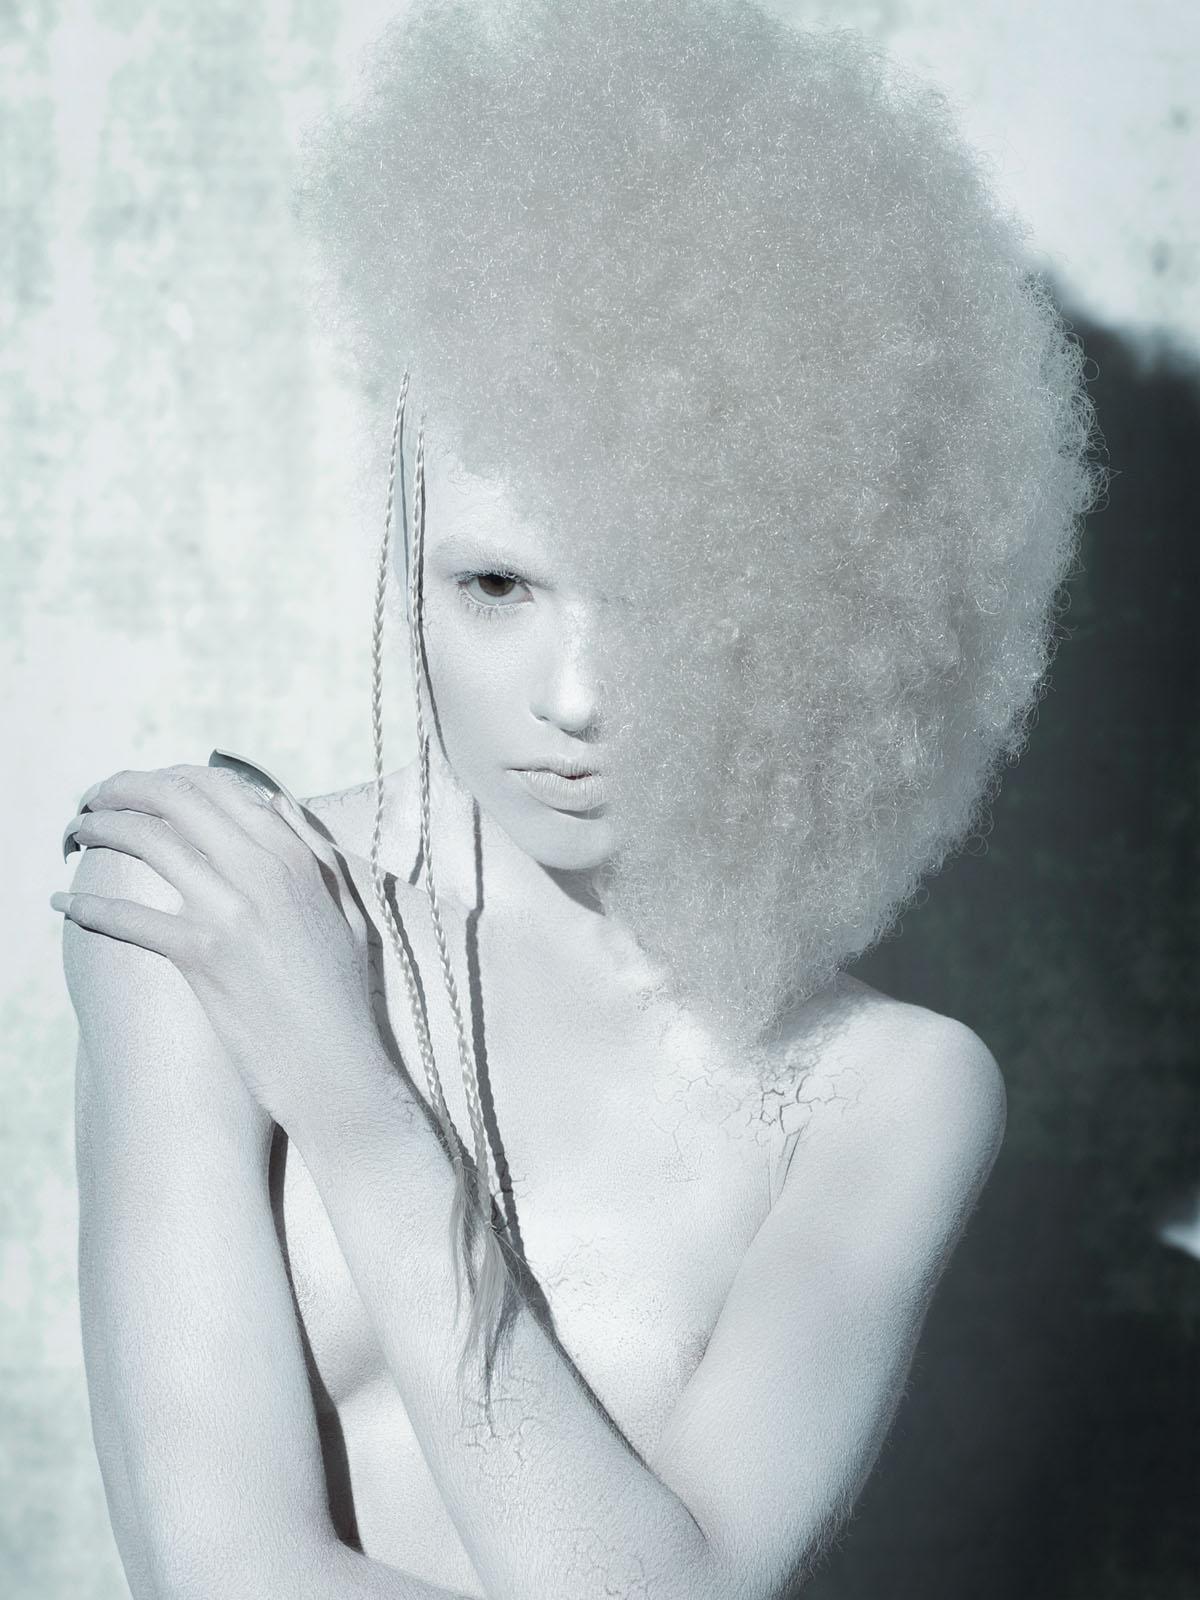 Raimondo Cantafio - Suzi Leenaars - hair Linh Nguyen - makeup Cheriene Waddell - makup assistant Lu Wang